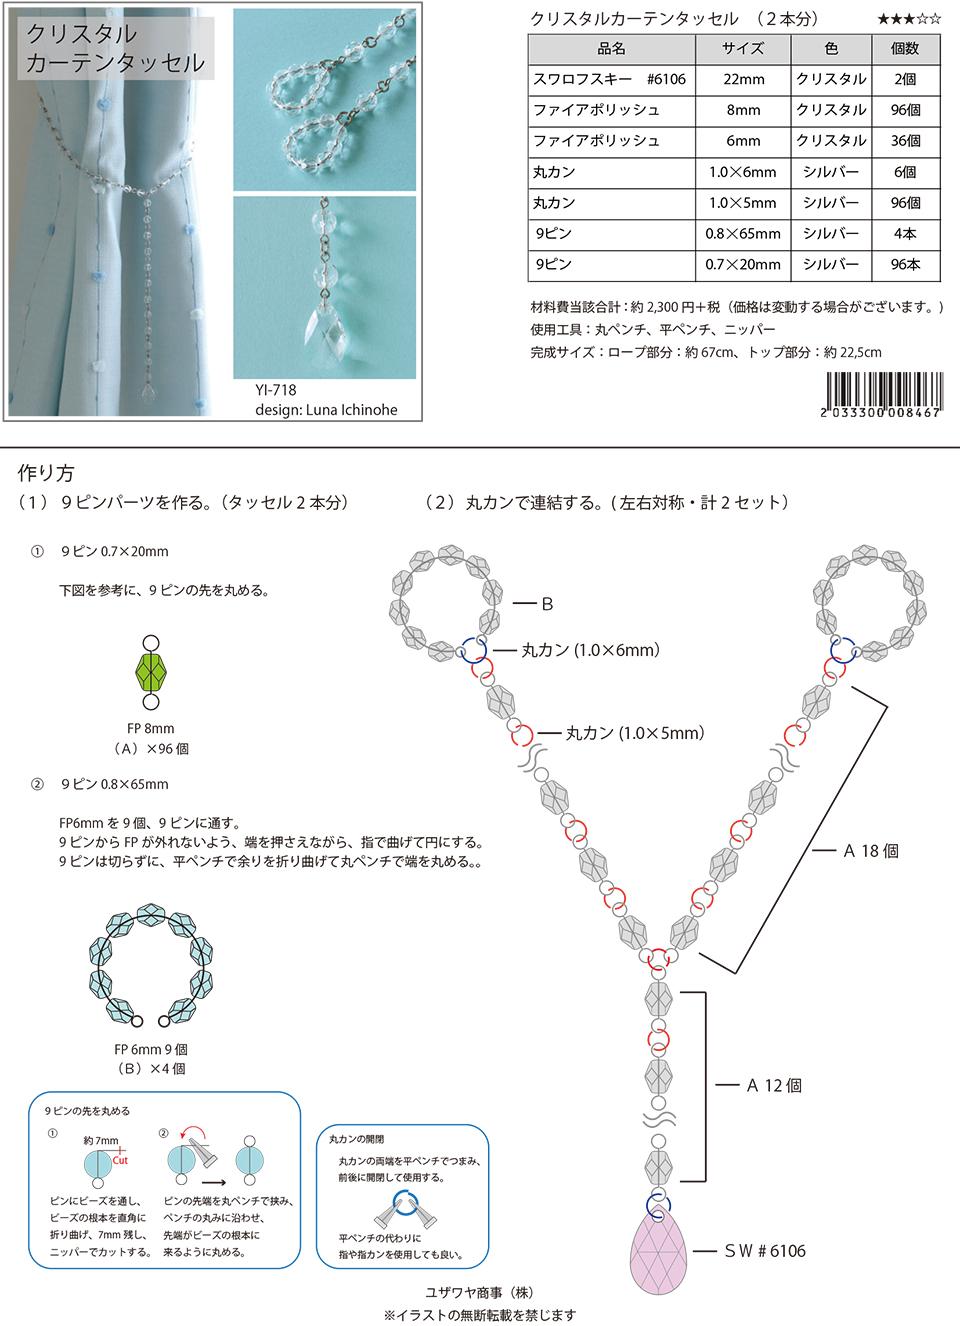 YI-718クリスタルカーテンタッセル_1.jpg